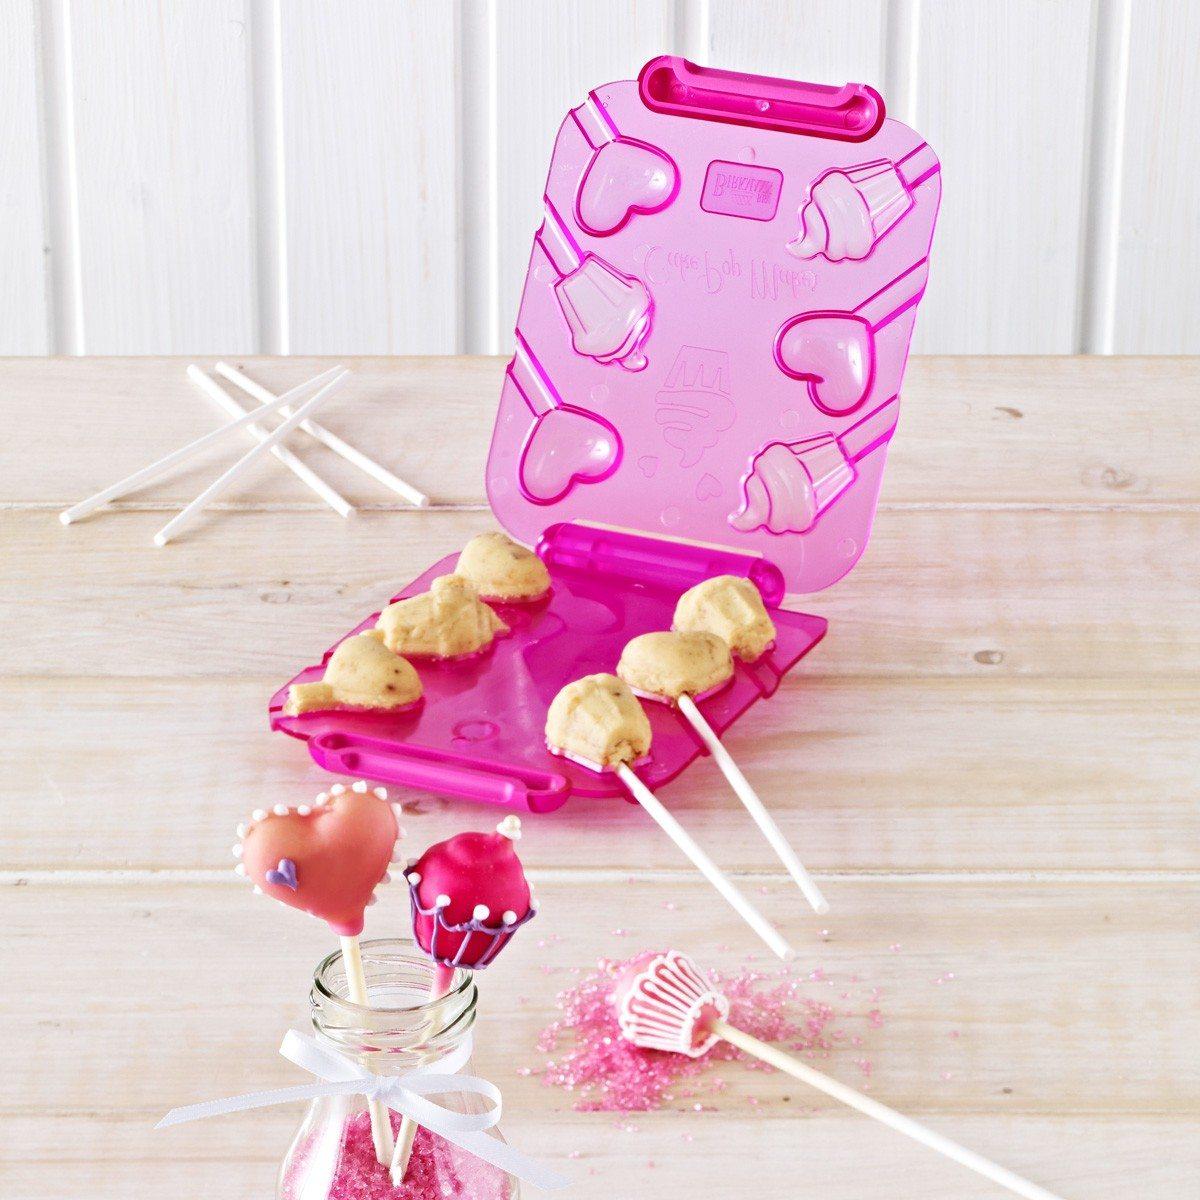 Hartjes & cupcakes - cakepop maker